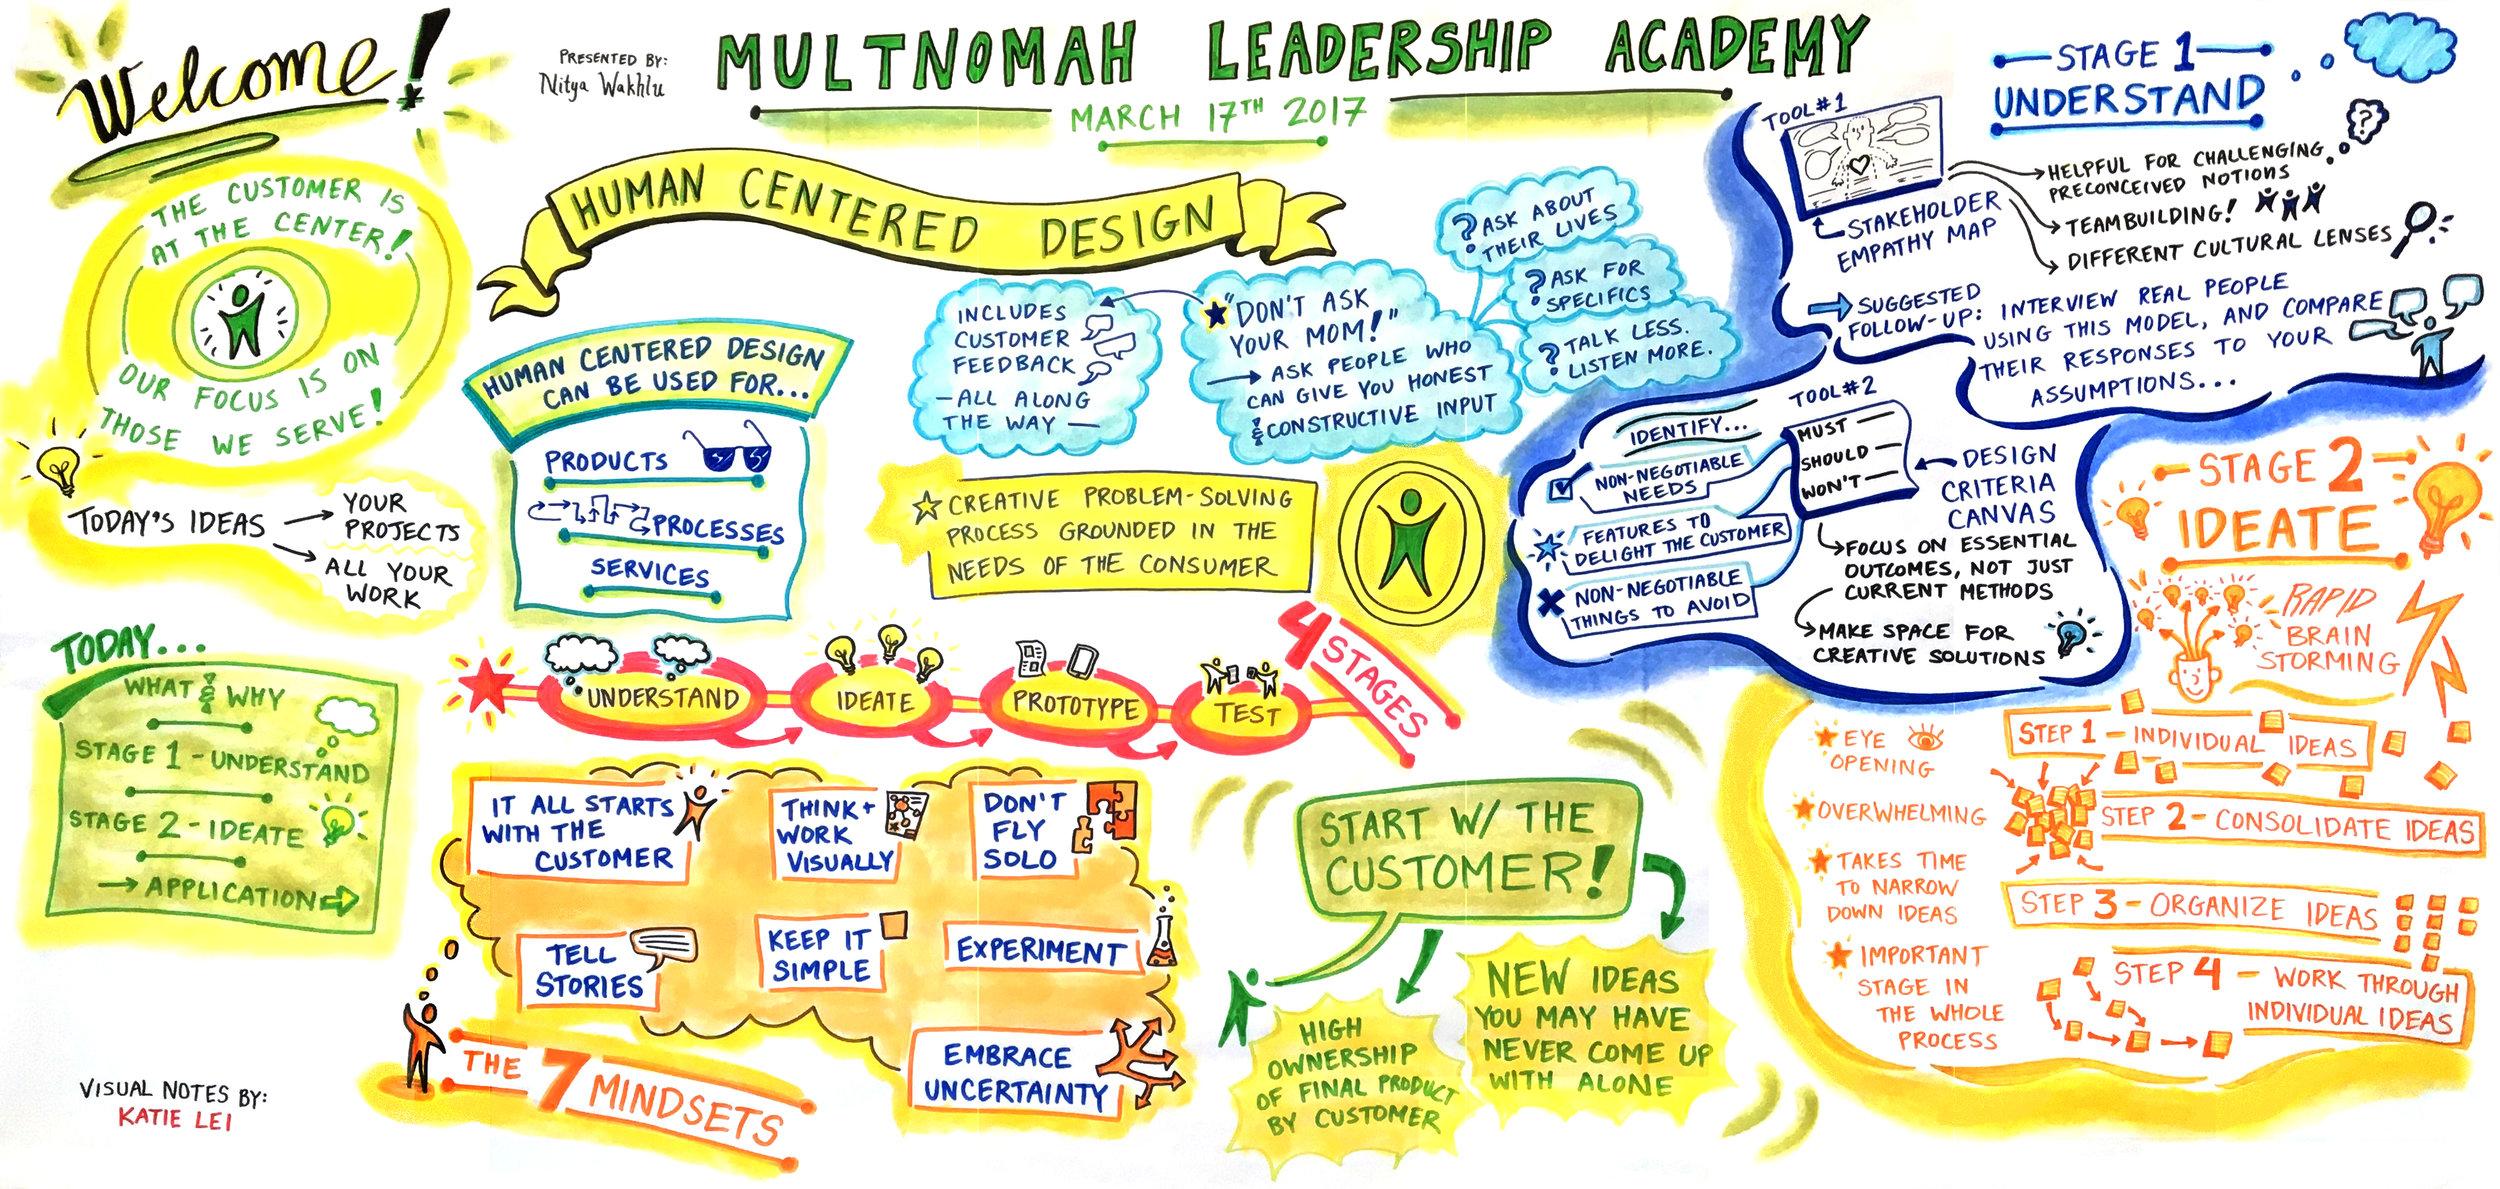 2017* Multnomah Leadership Academy .jpg